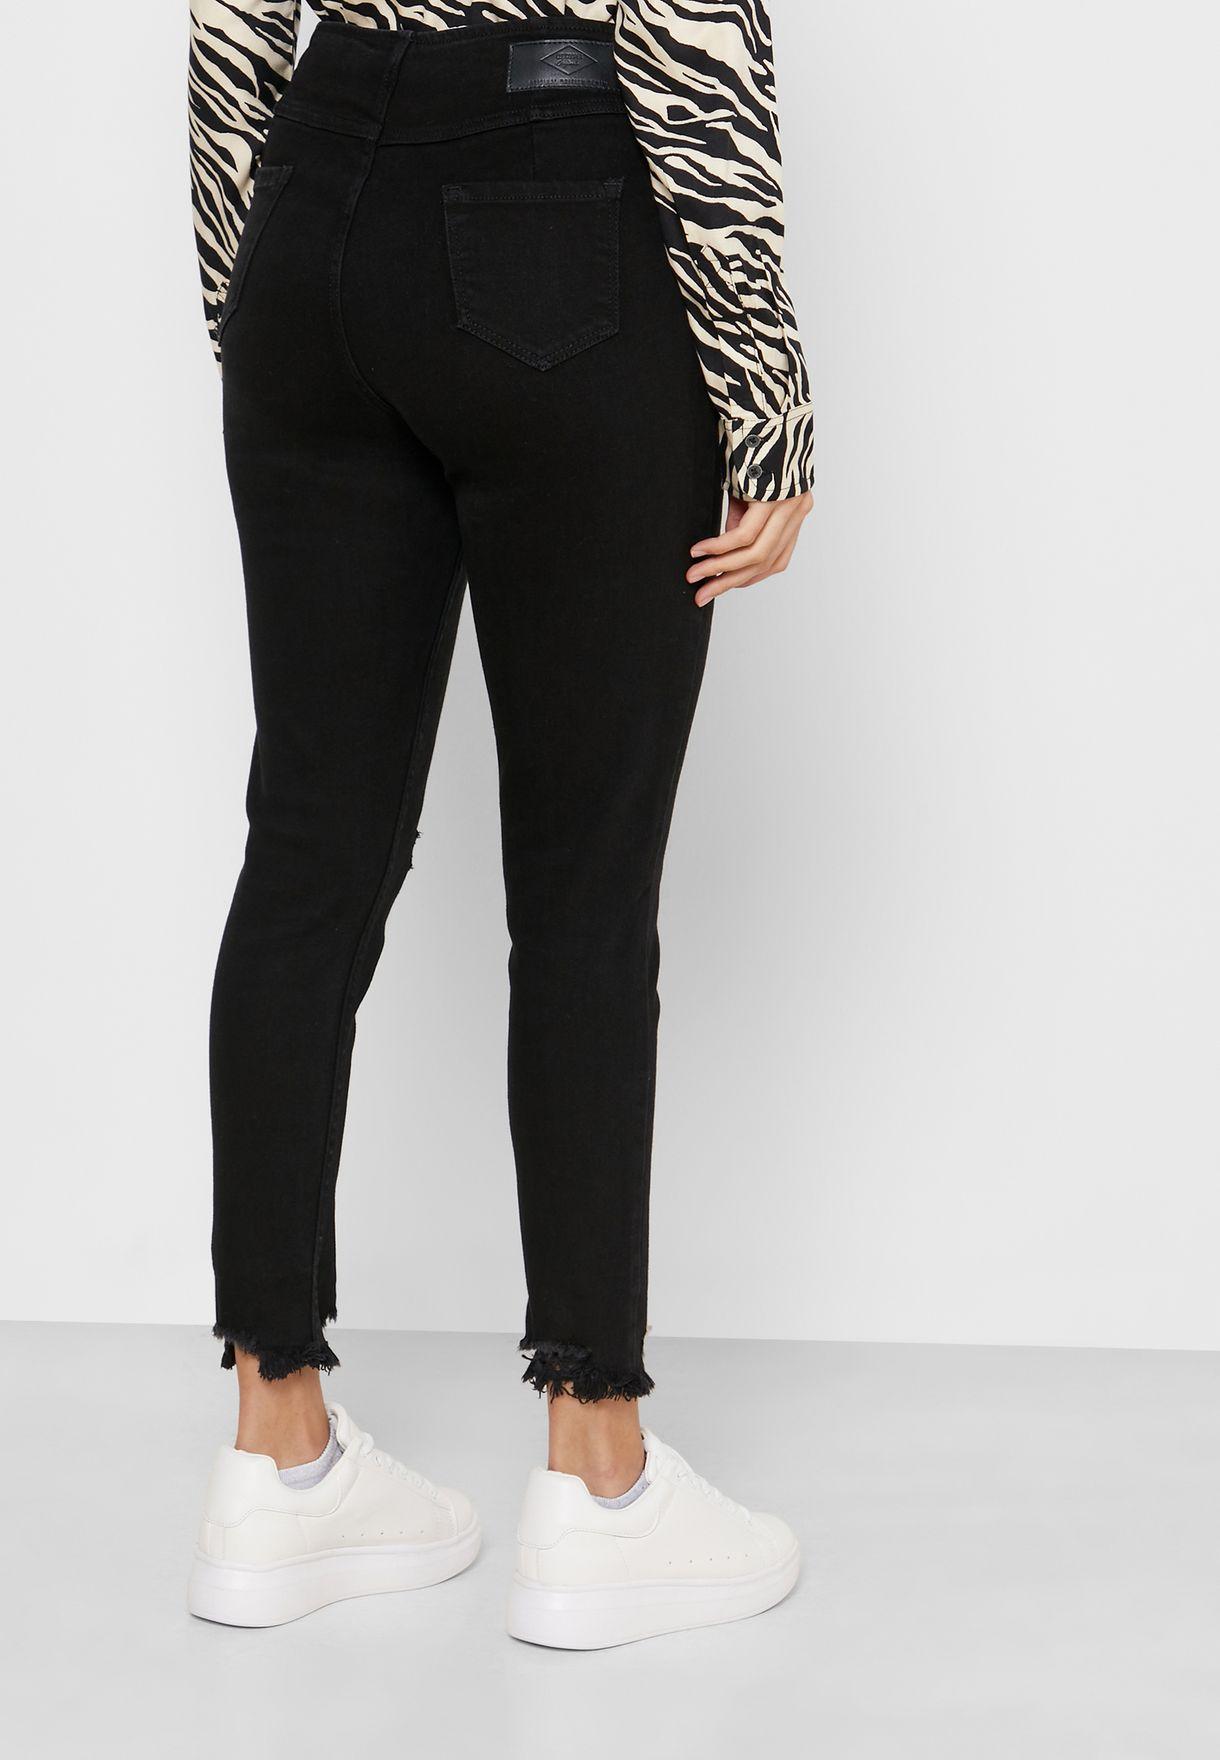 Zip Detail Distressed Jeans